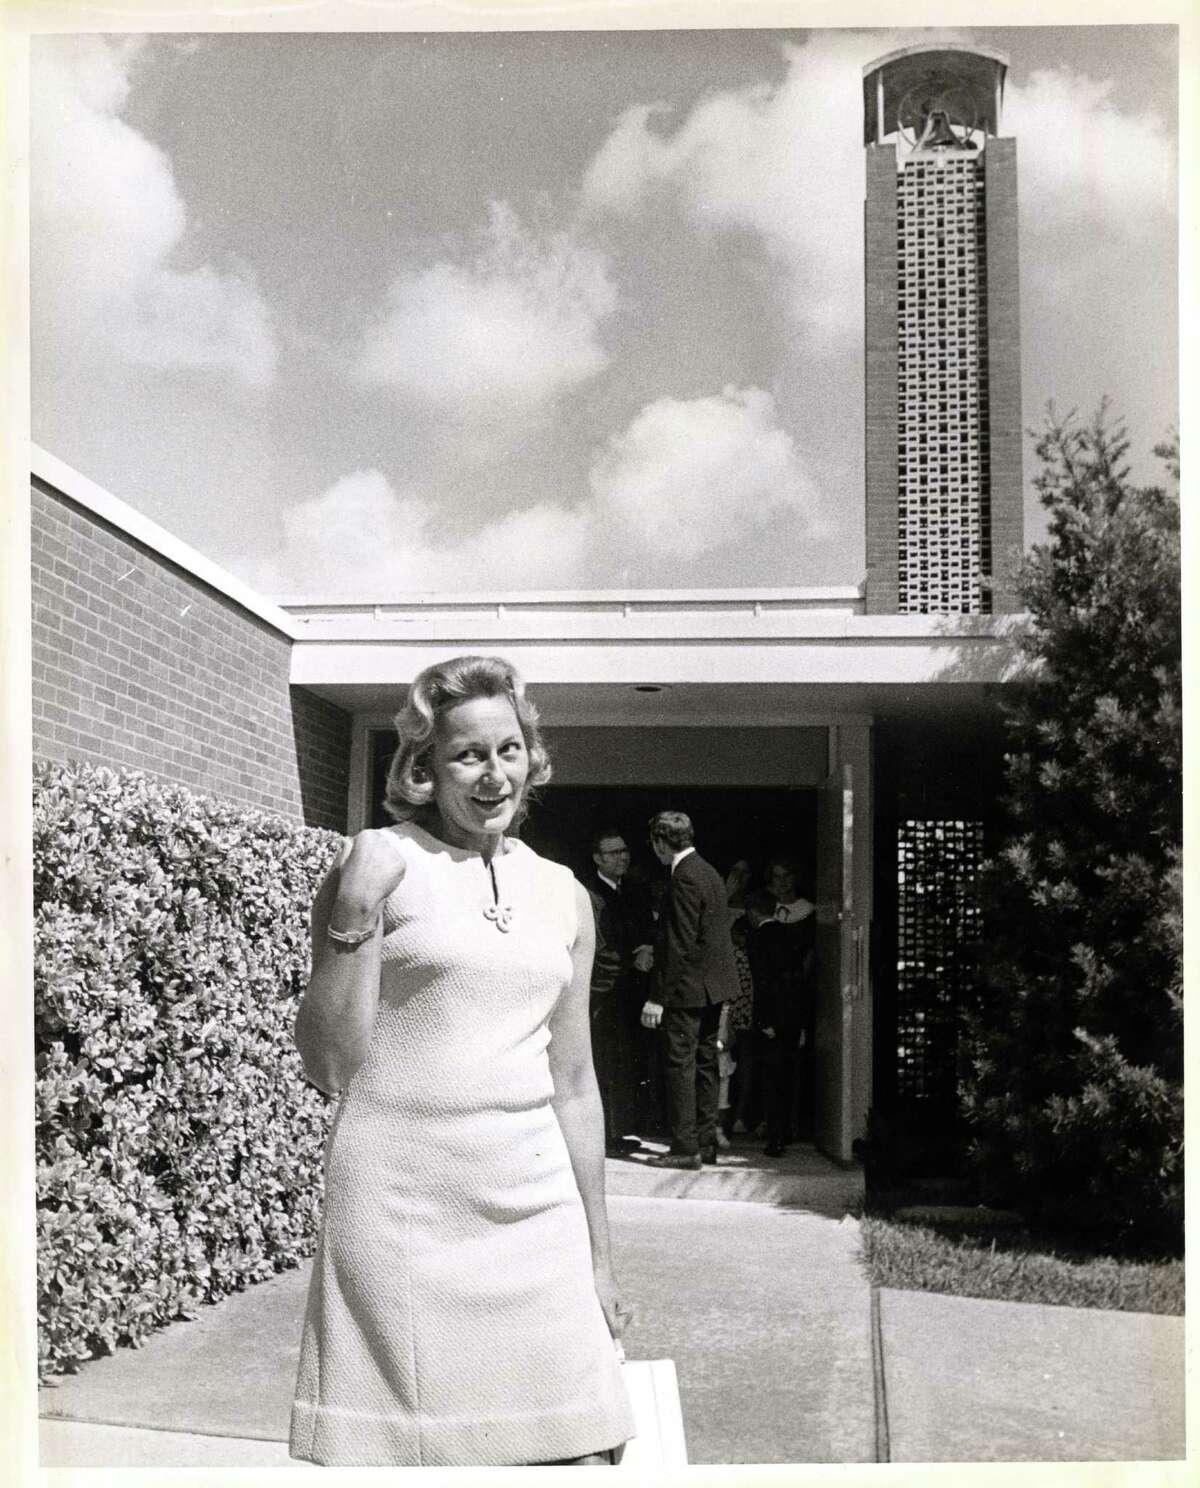 "08/01/1969 - Joan Aldrin, Apollo 11 astronaut Edwin ""Buzz"" Aldrin's wife, leaving Webster Presbyterian Church in Webster, TX One of the men in the background is Rev. Dean Woodruff. Ray Covey / Houston Post"